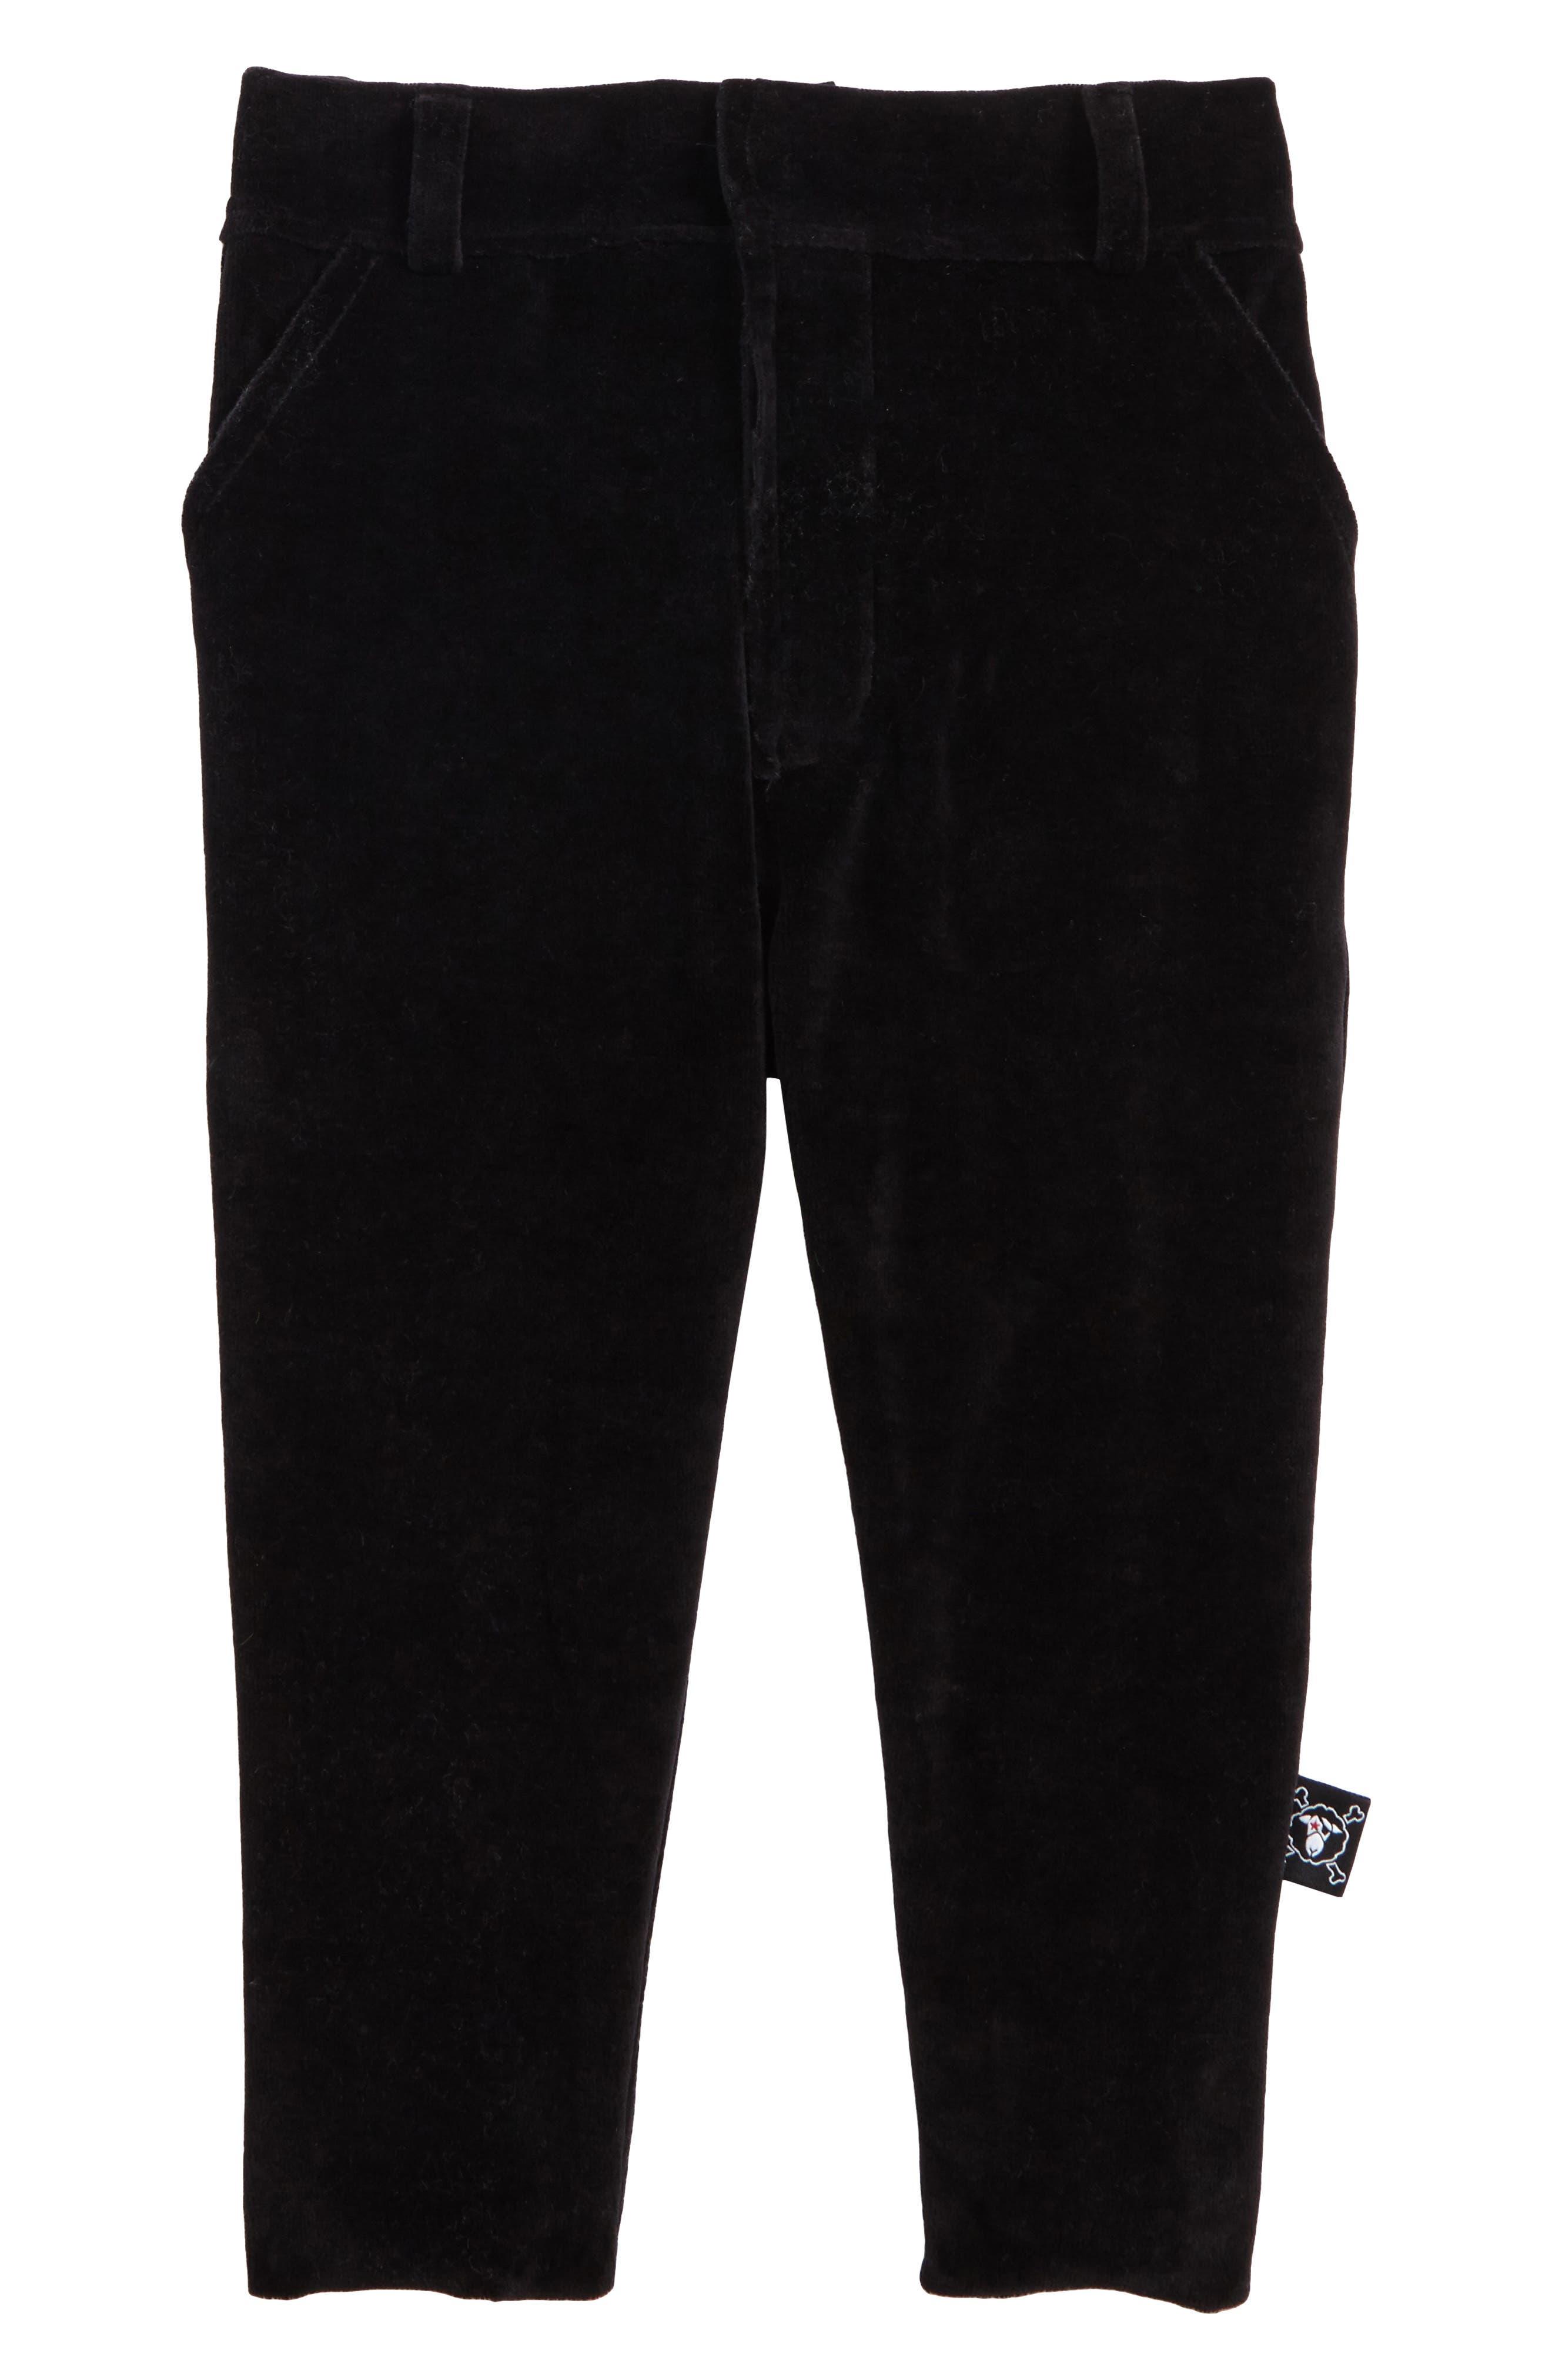 Velvet Pants,                         Main,                         color, Black